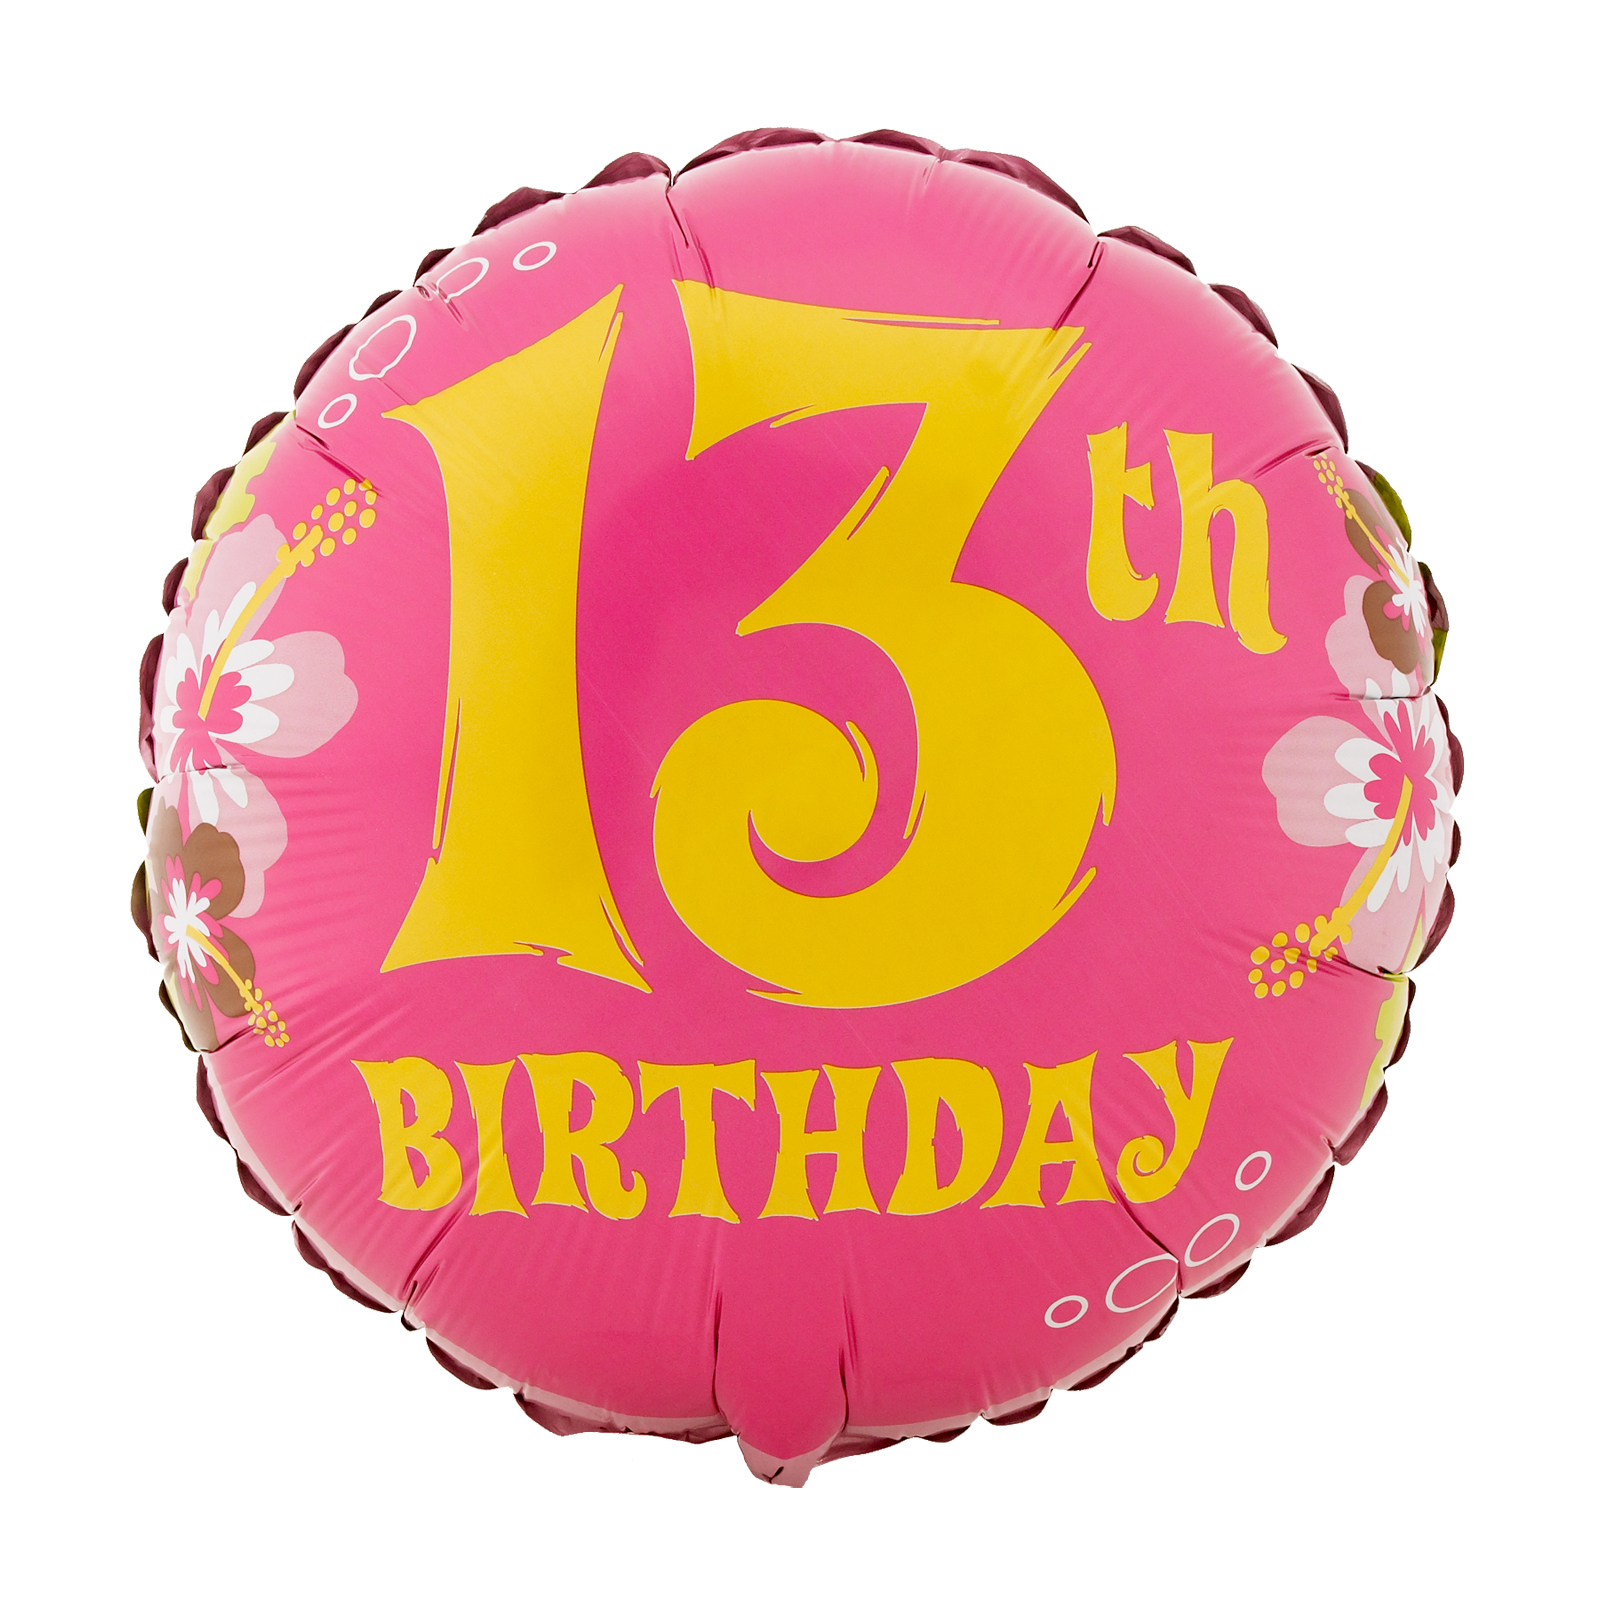 13th Birthday Clip Art N2 free image.